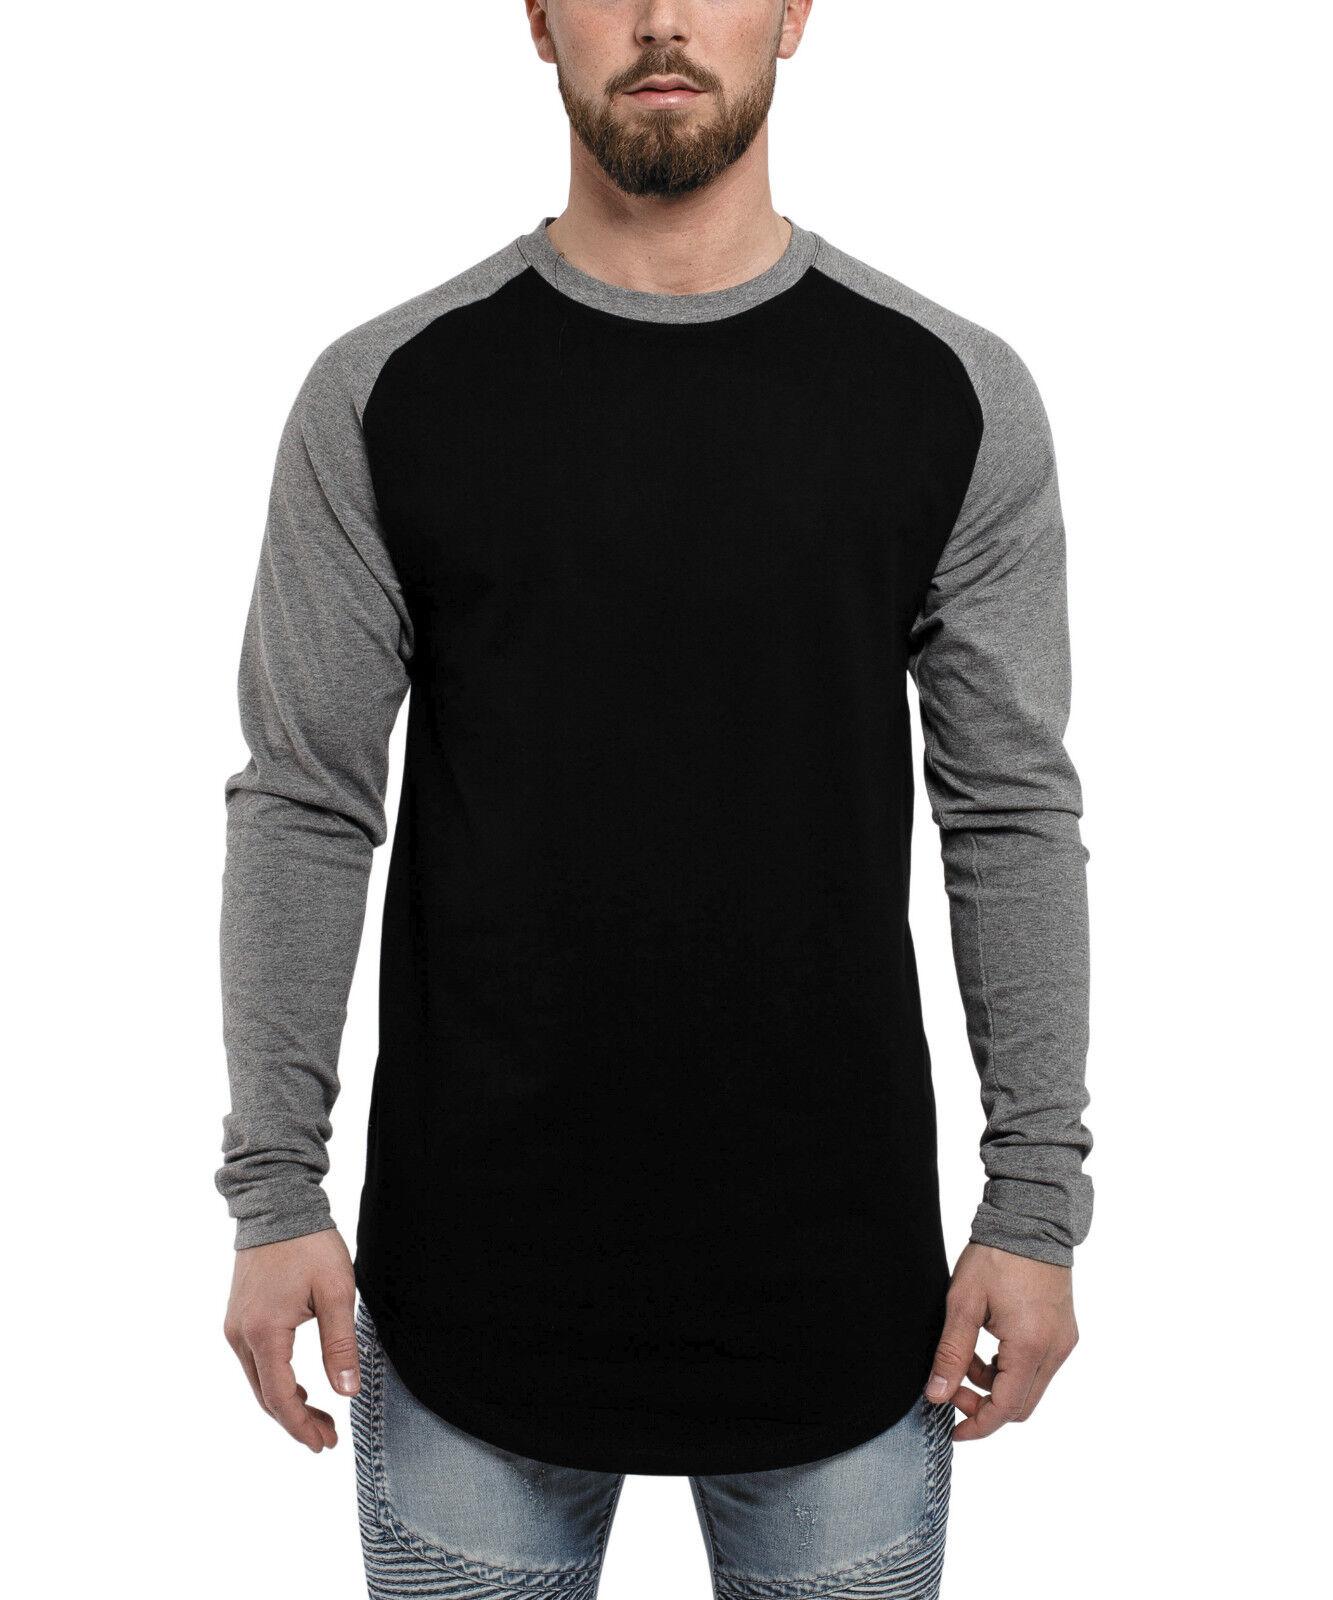 Blackskies Baseball T-Shirt Longshirt Schwarz Grau Longline Herren Men Basic Tee